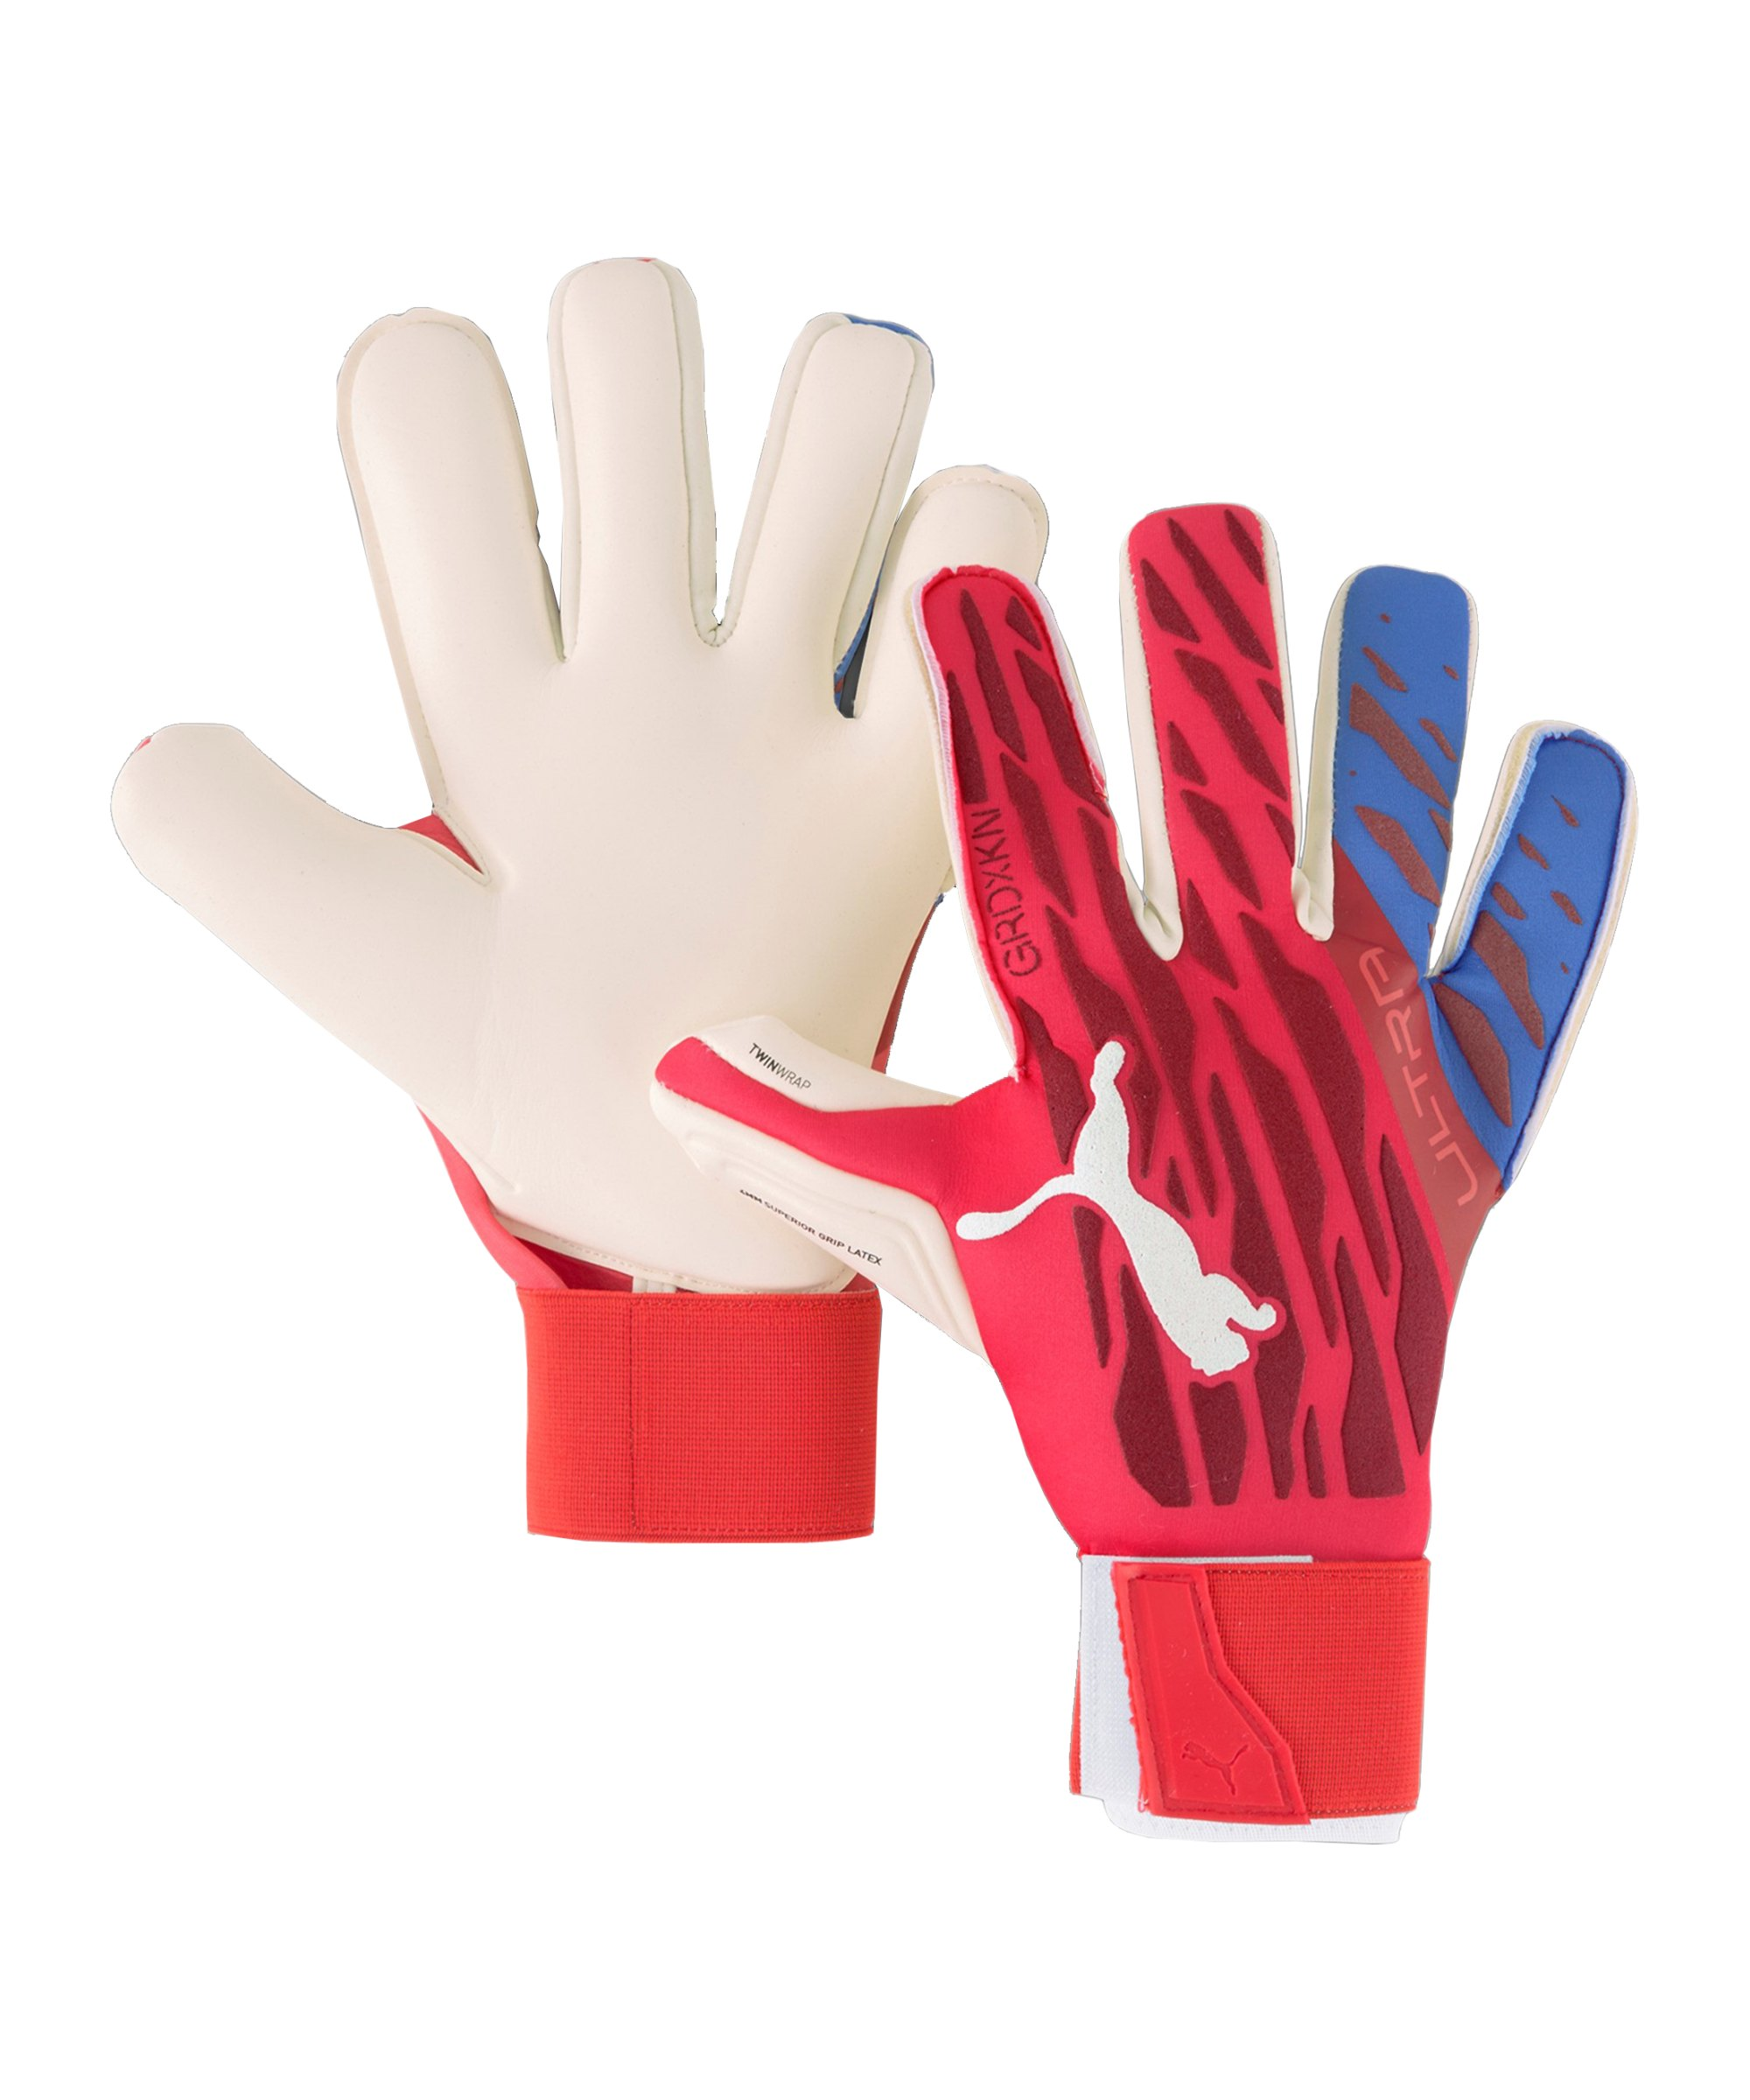 PUMA ULTRA Grip 1 Hyprid Pro Faster FootballTorwarthandschuh Rot F01 - rot